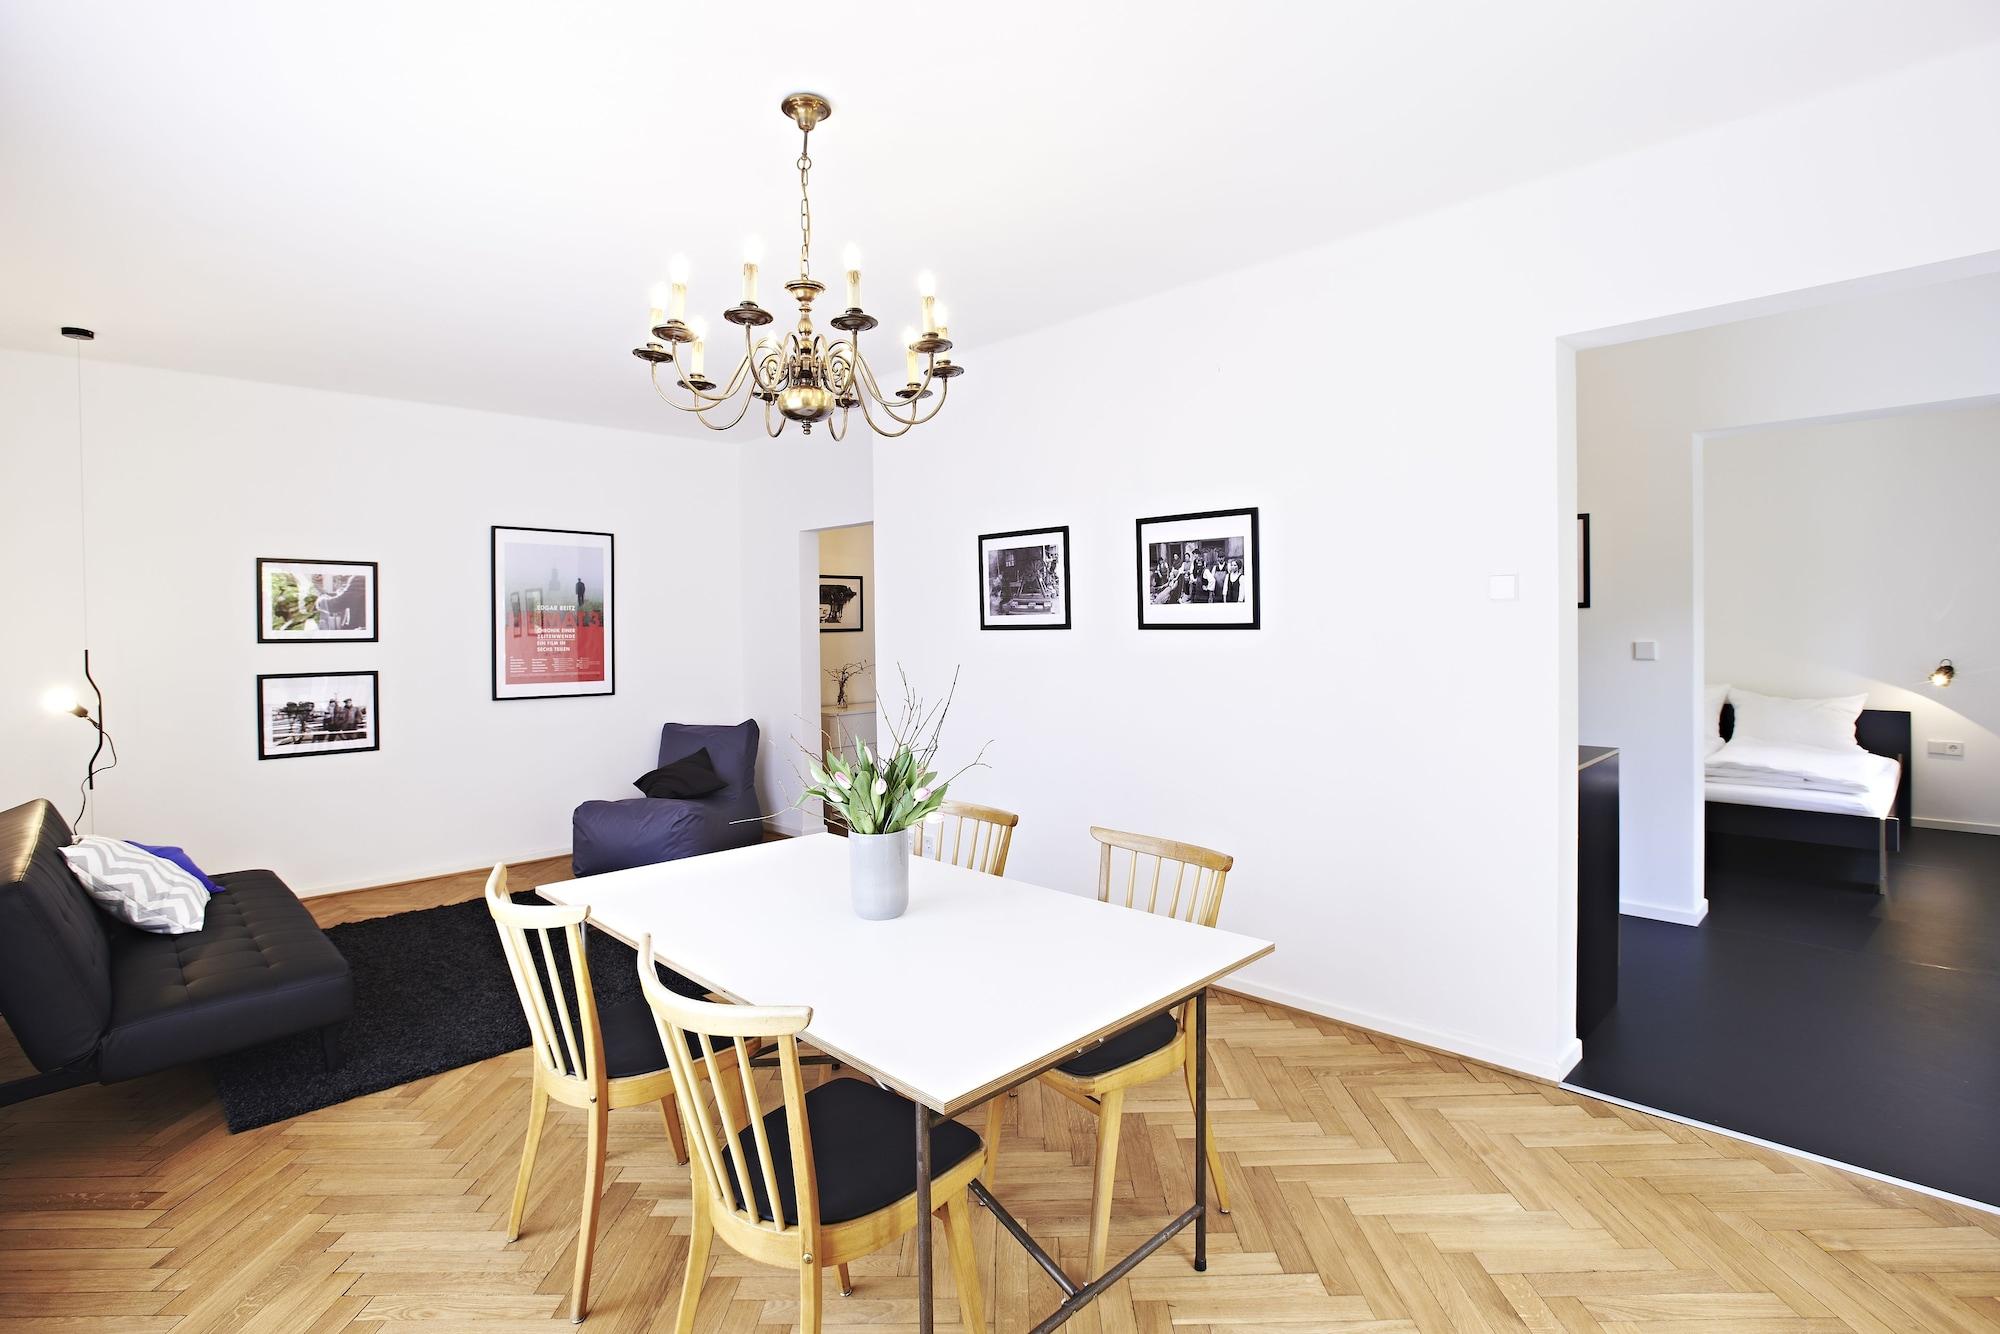 SOON Appartements, Rhein-Hunsrück-Kreis